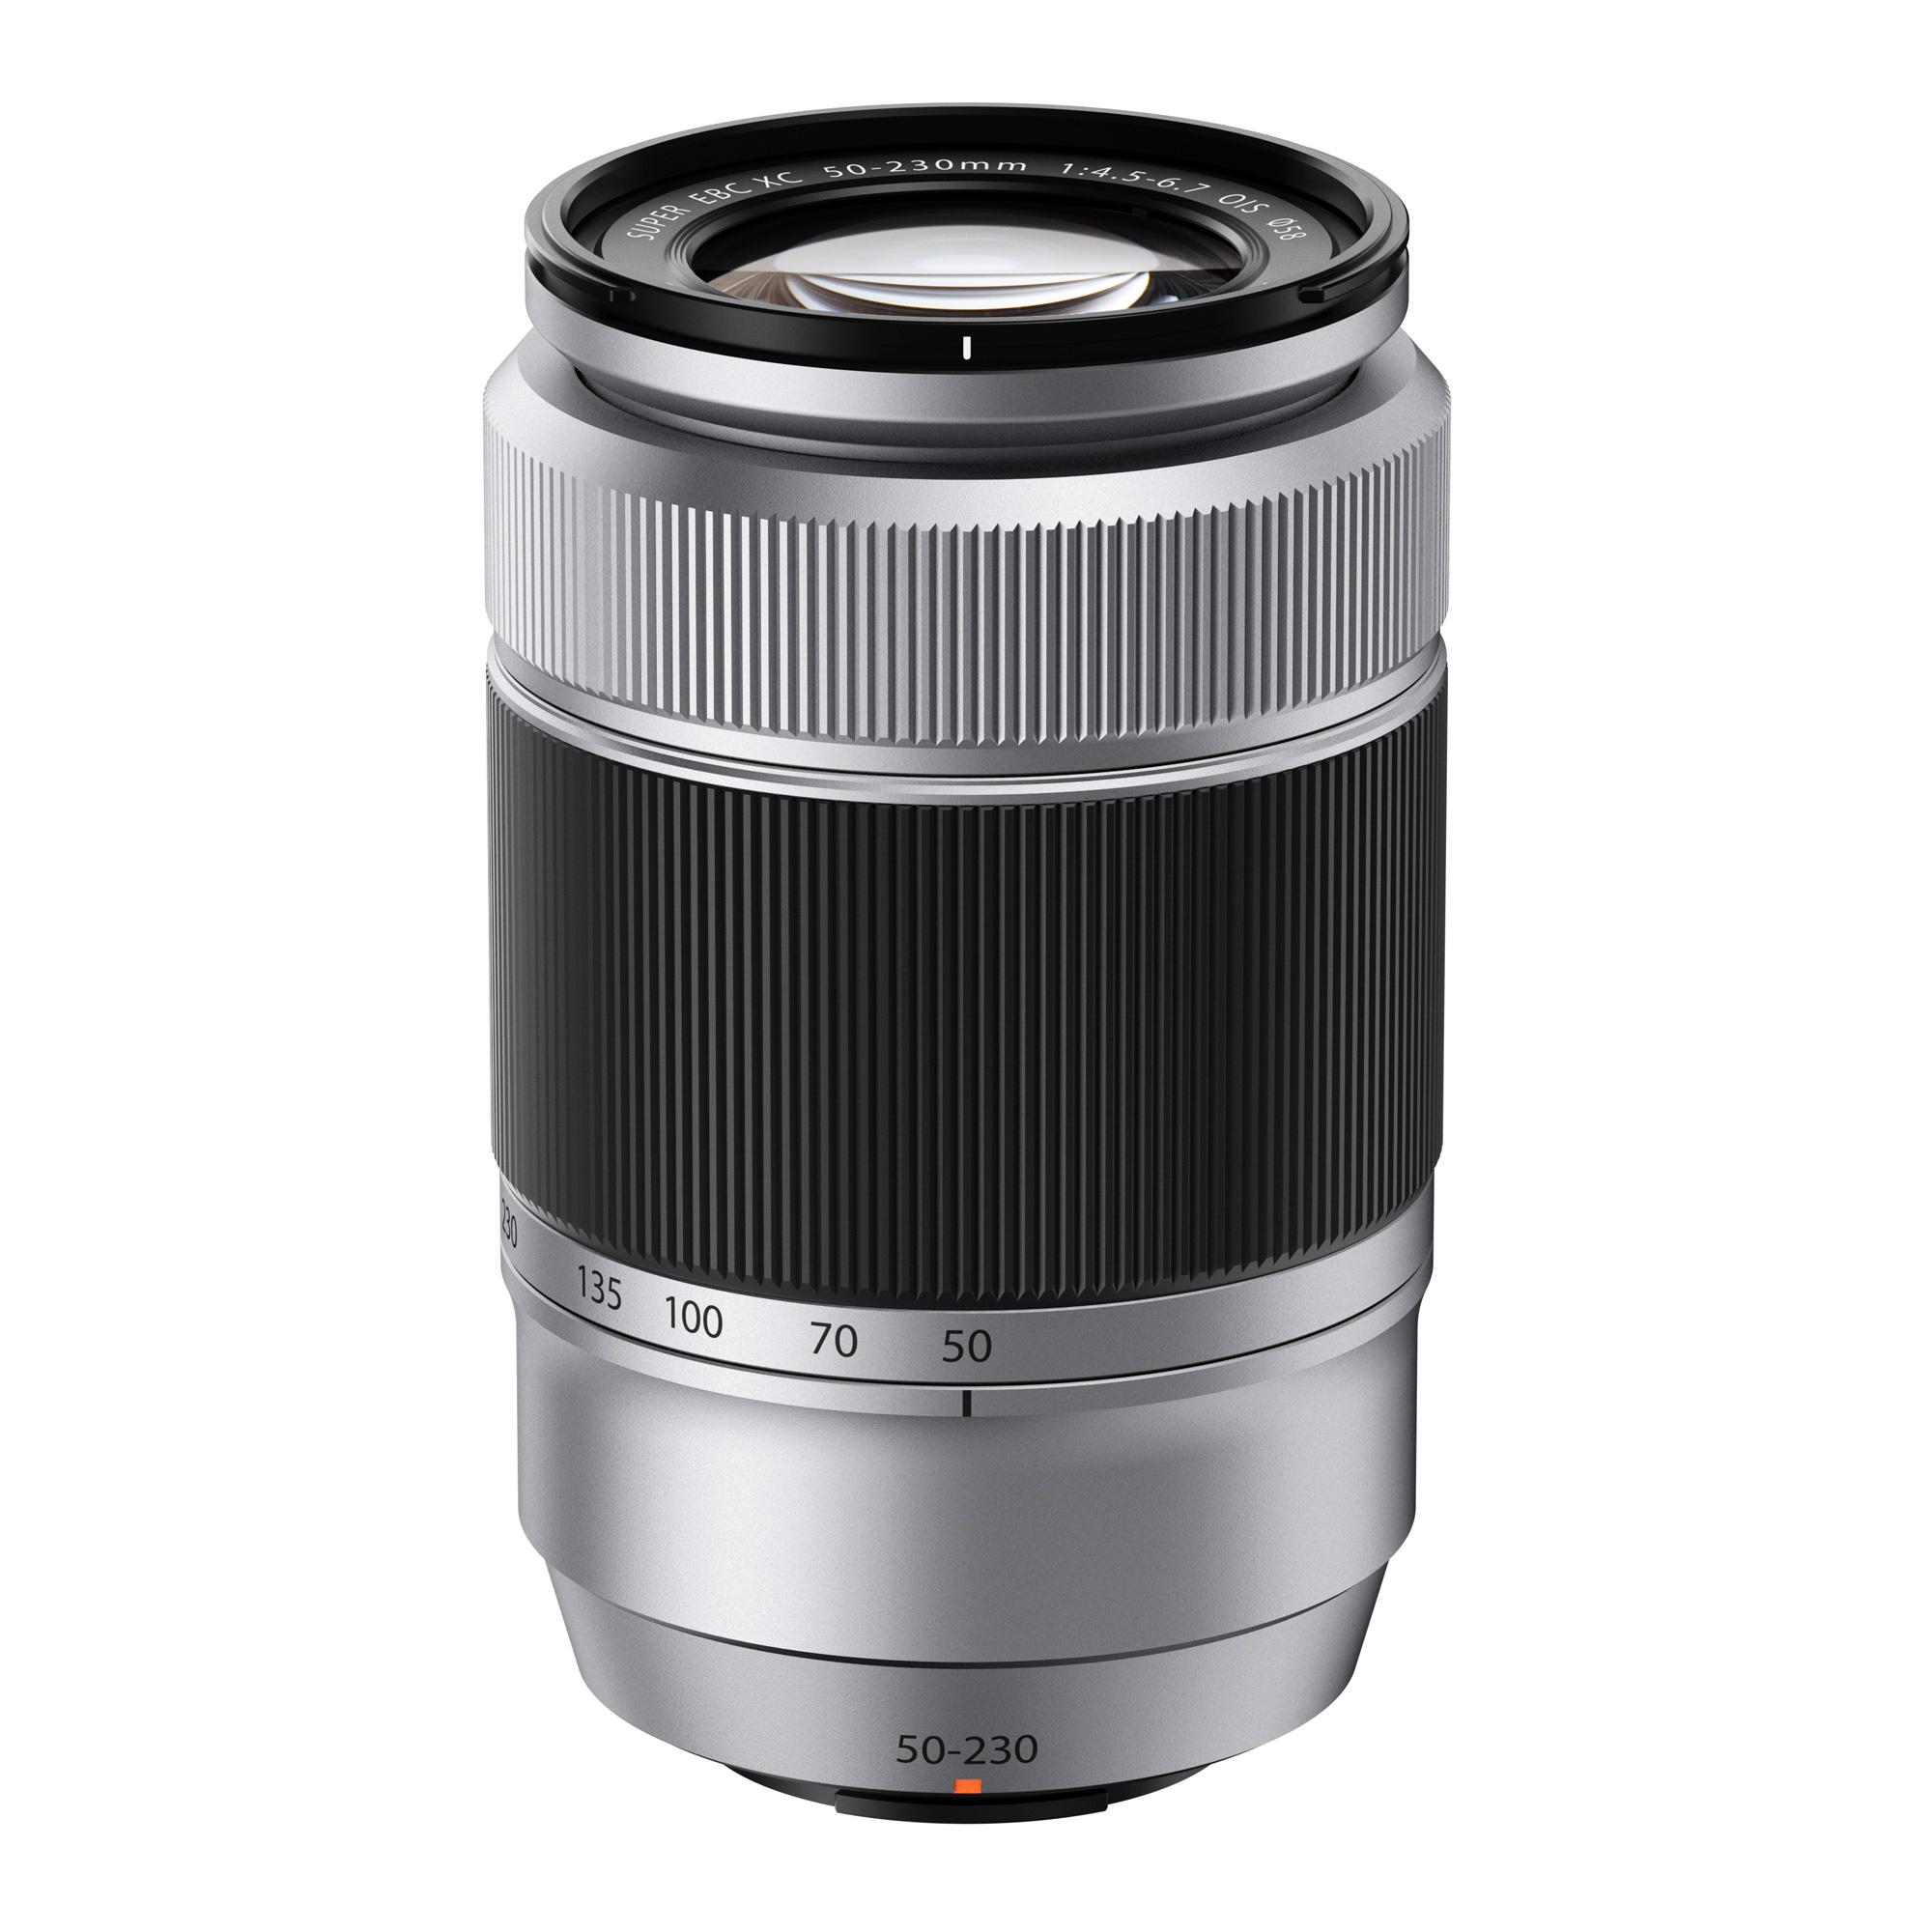 Image of Fujifilm FUJINON XC 50-230mm f/4.5-6.7 OIS Lens (Silver)